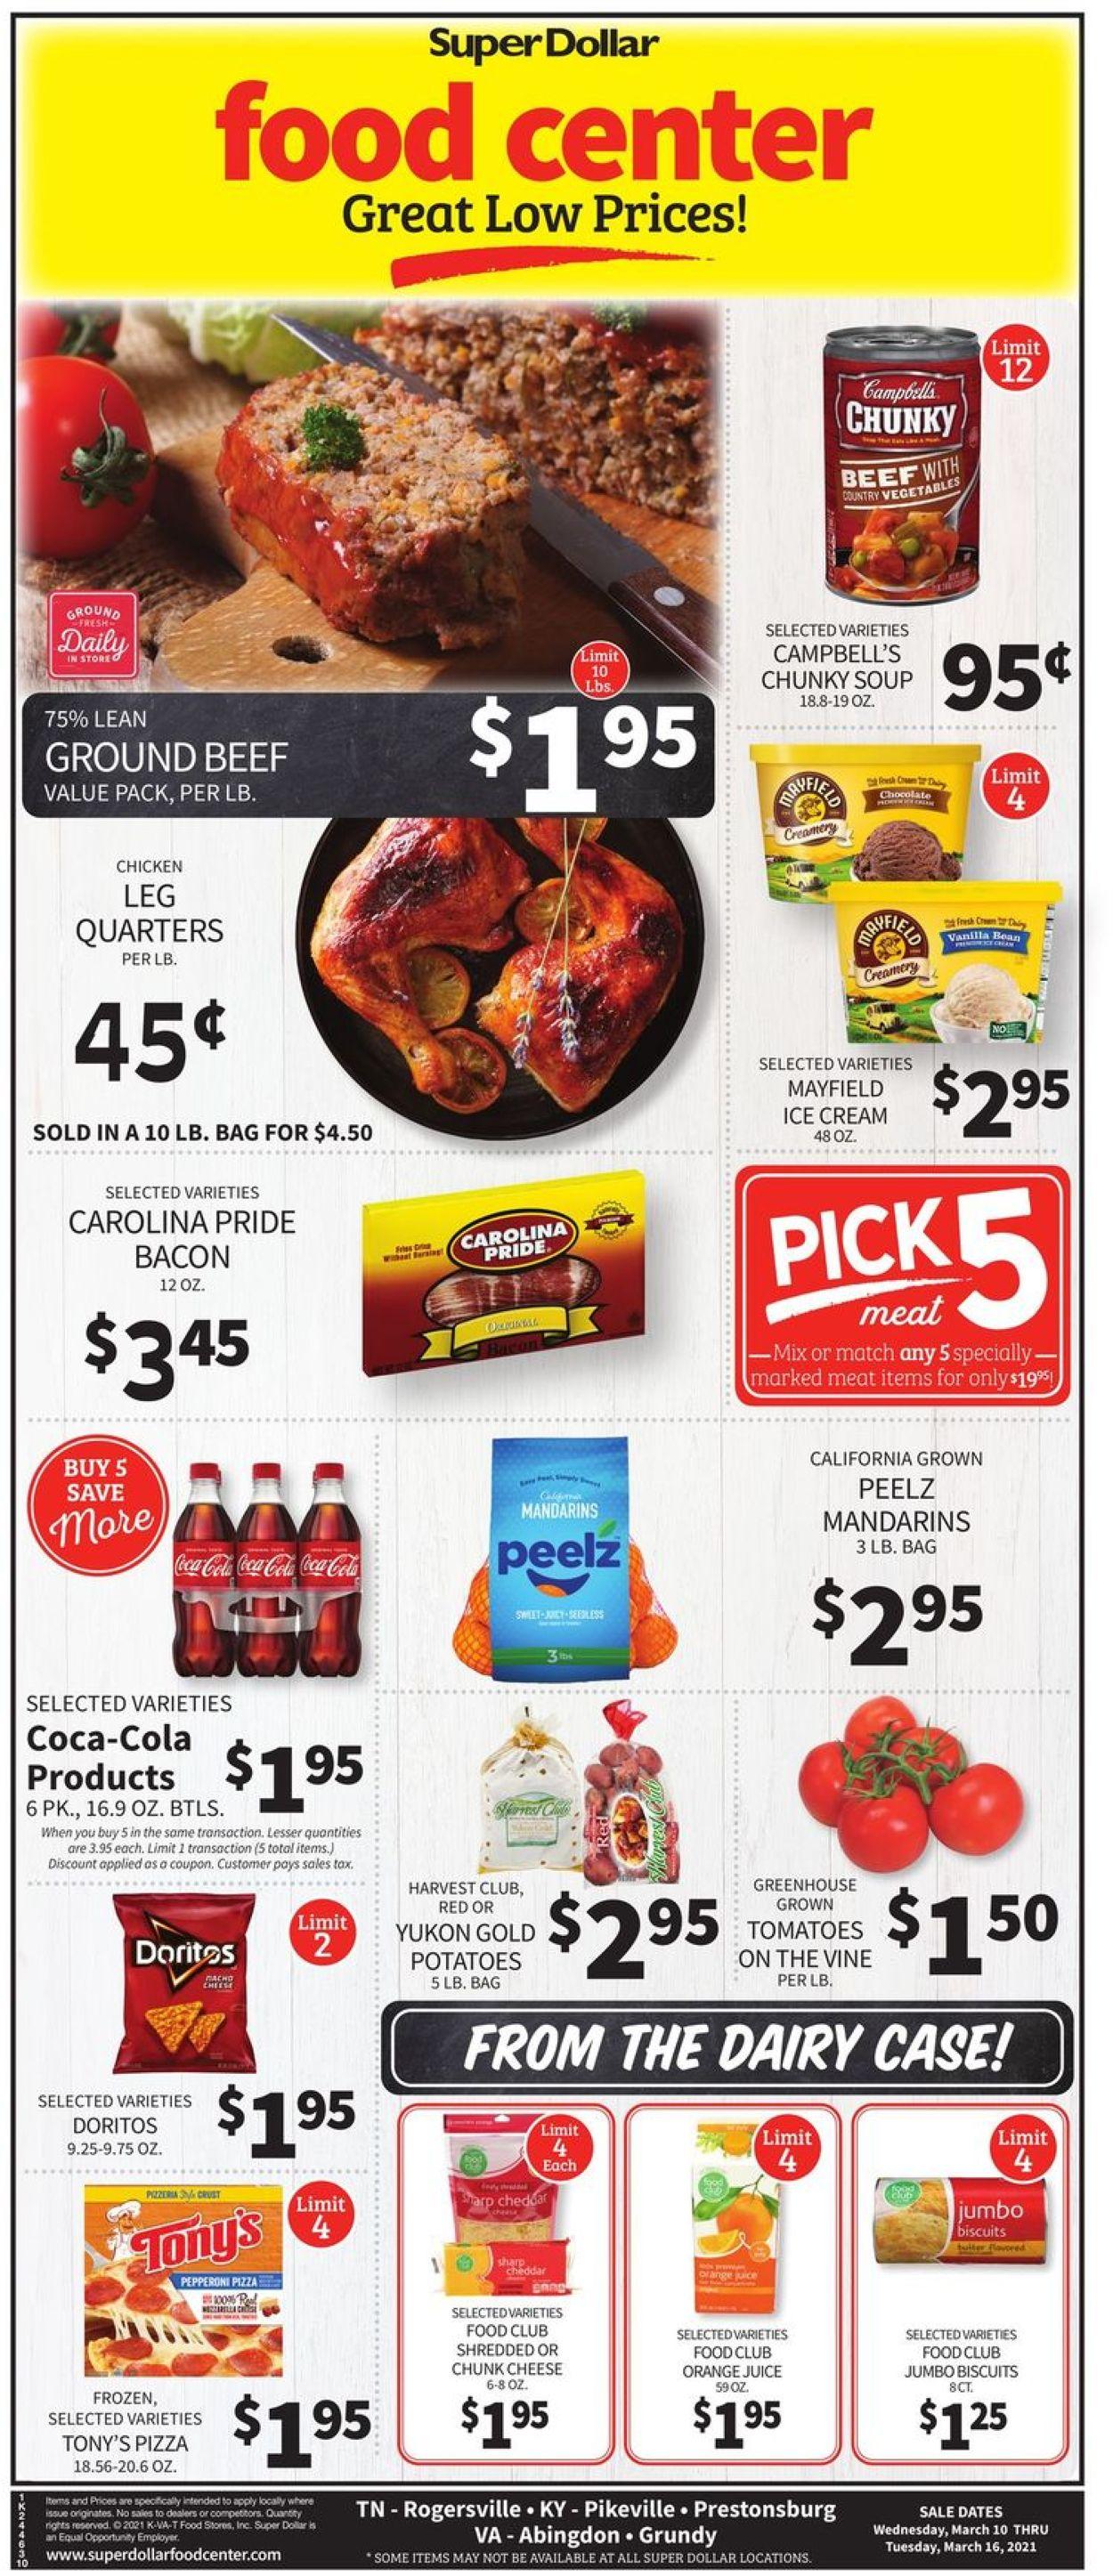 Super Dollar Food Center Weekly Ad Circular - valid 03/10-03/16/2021